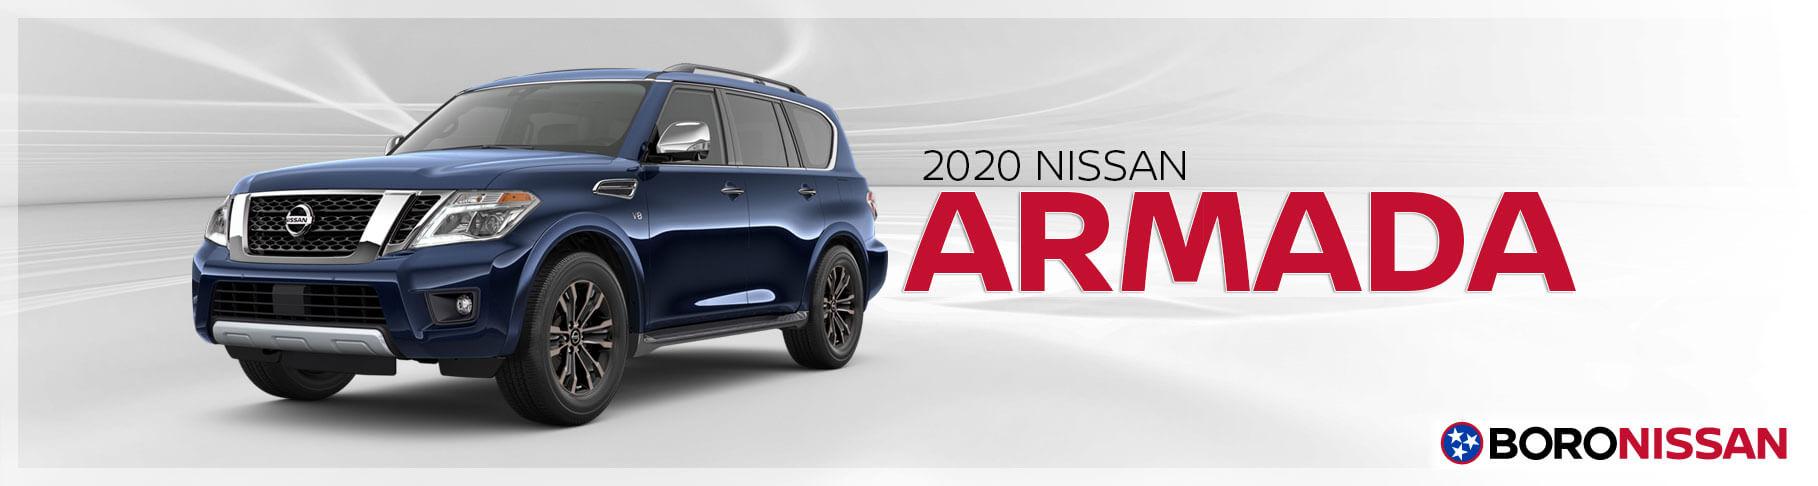 The New 2020 Nissan Armada